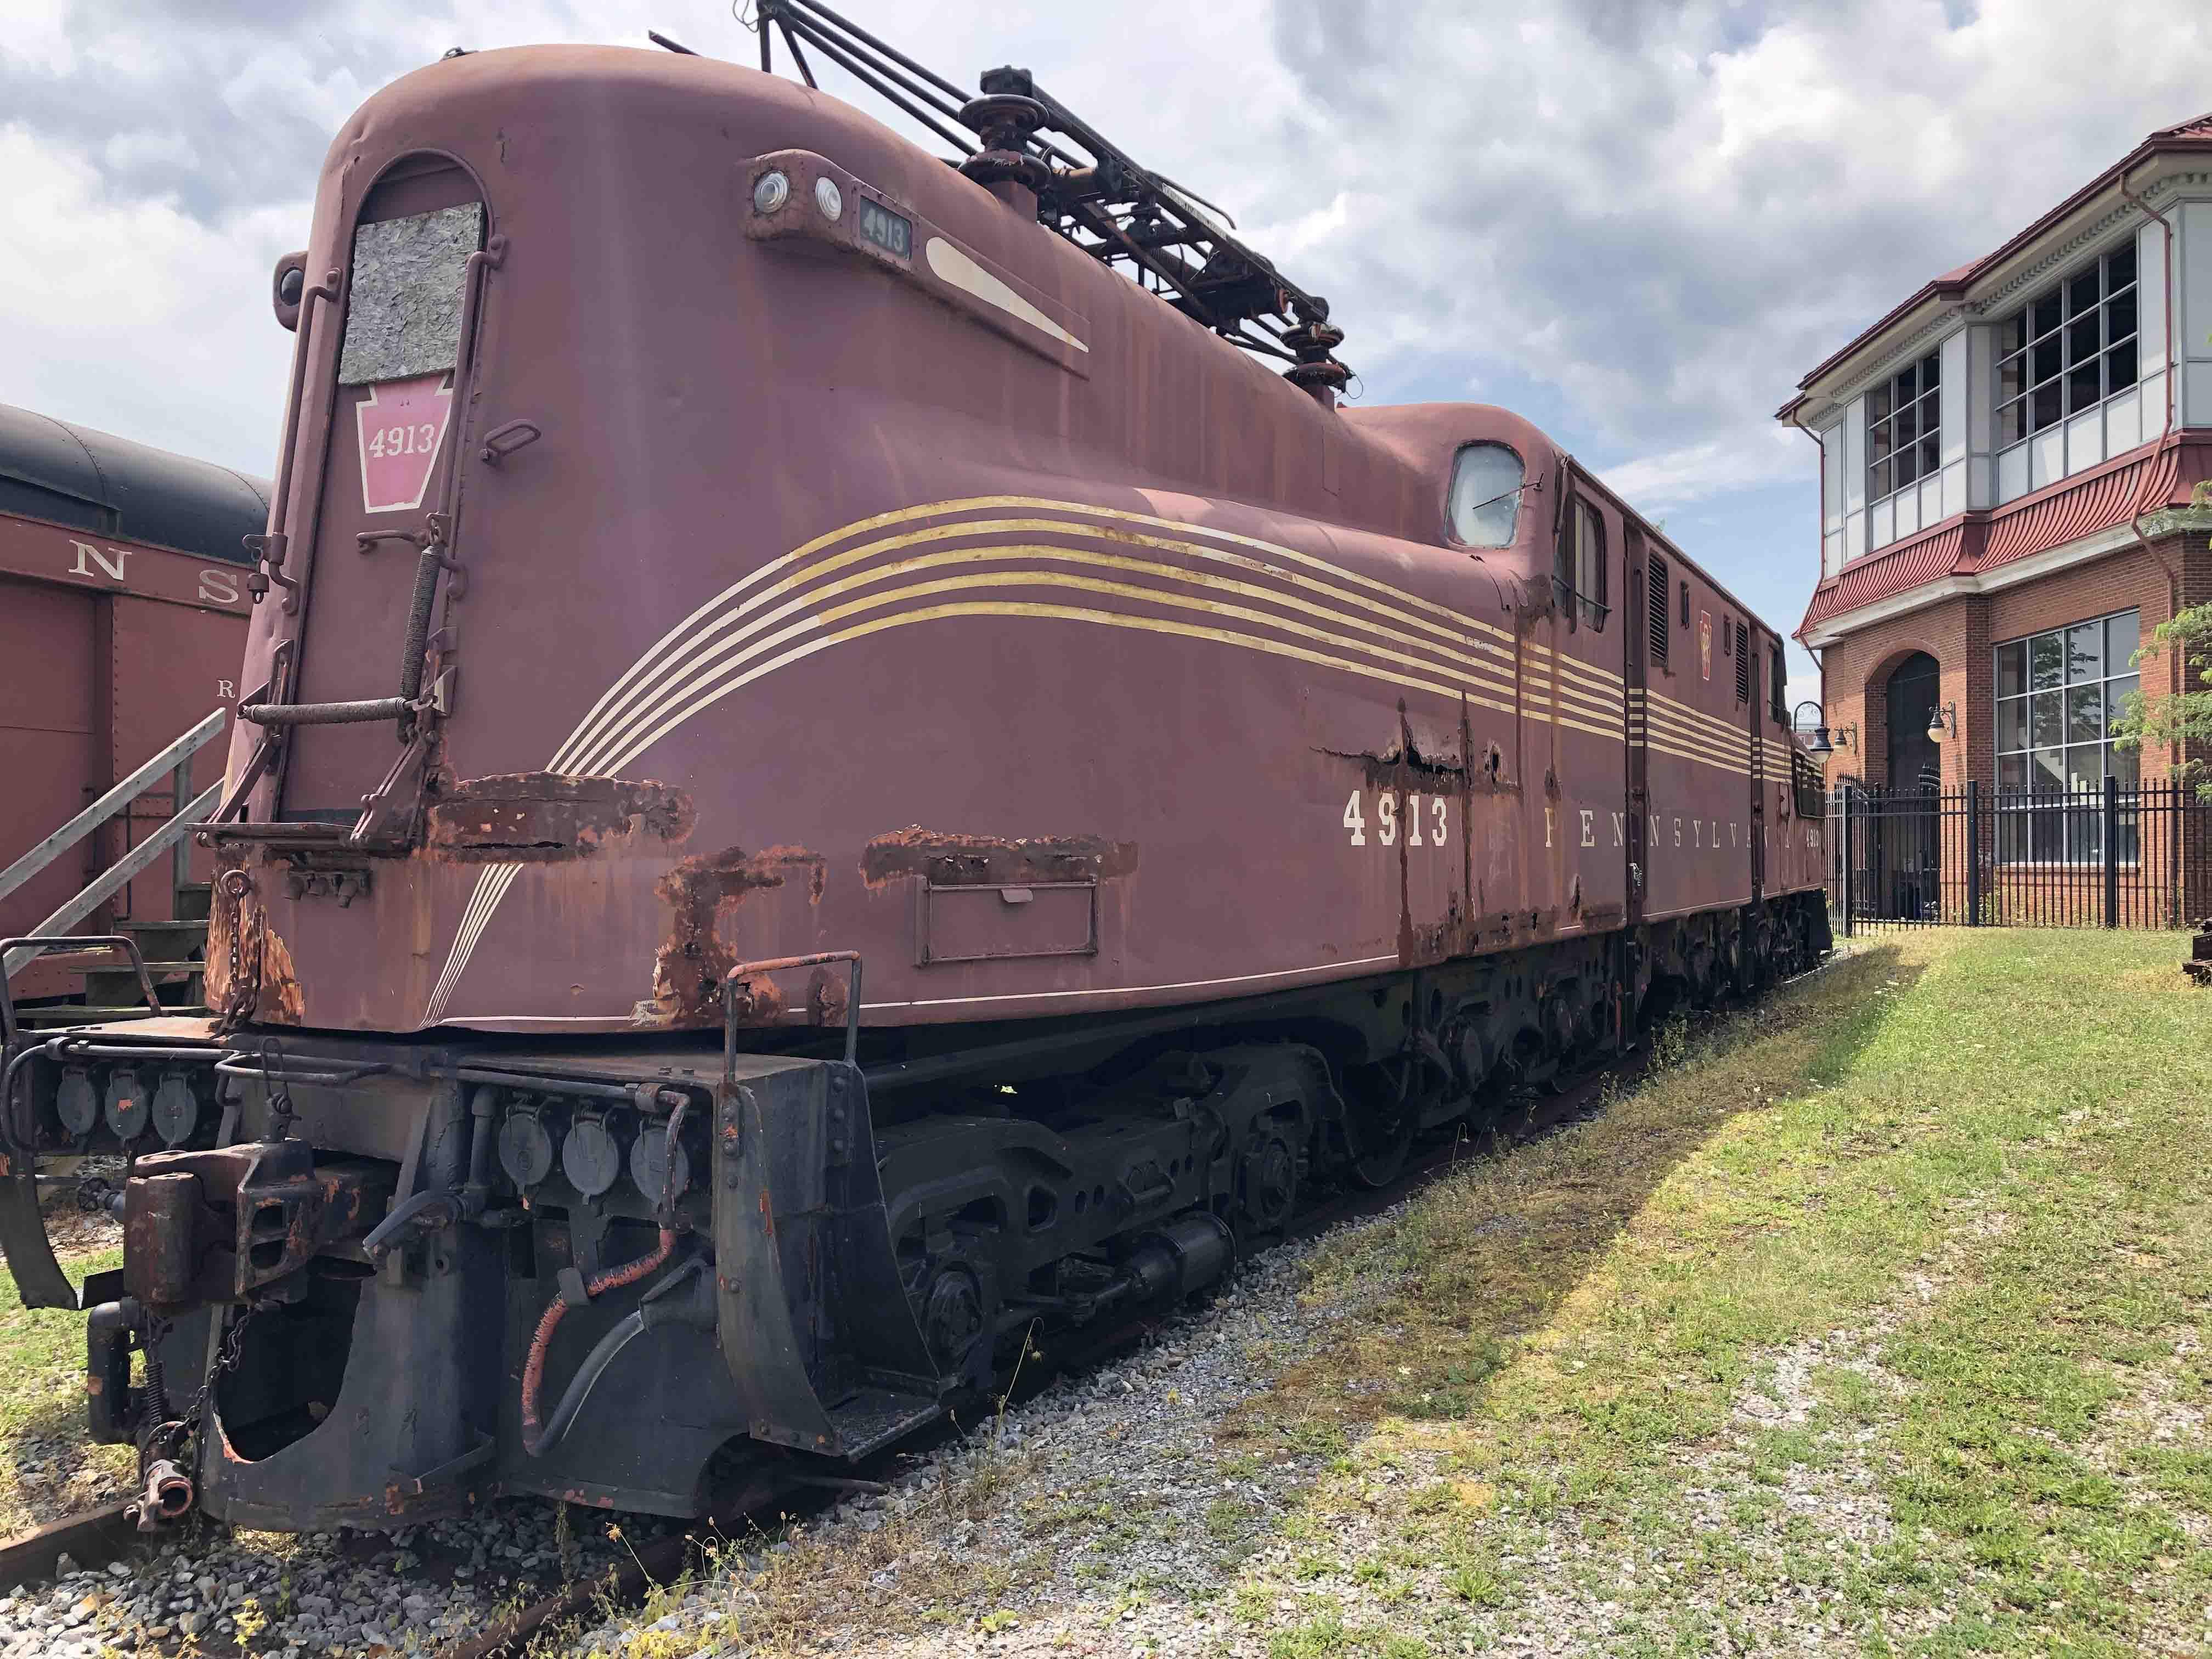 Pennsylvania-Railroad-GG1-4913-Roger-Puta